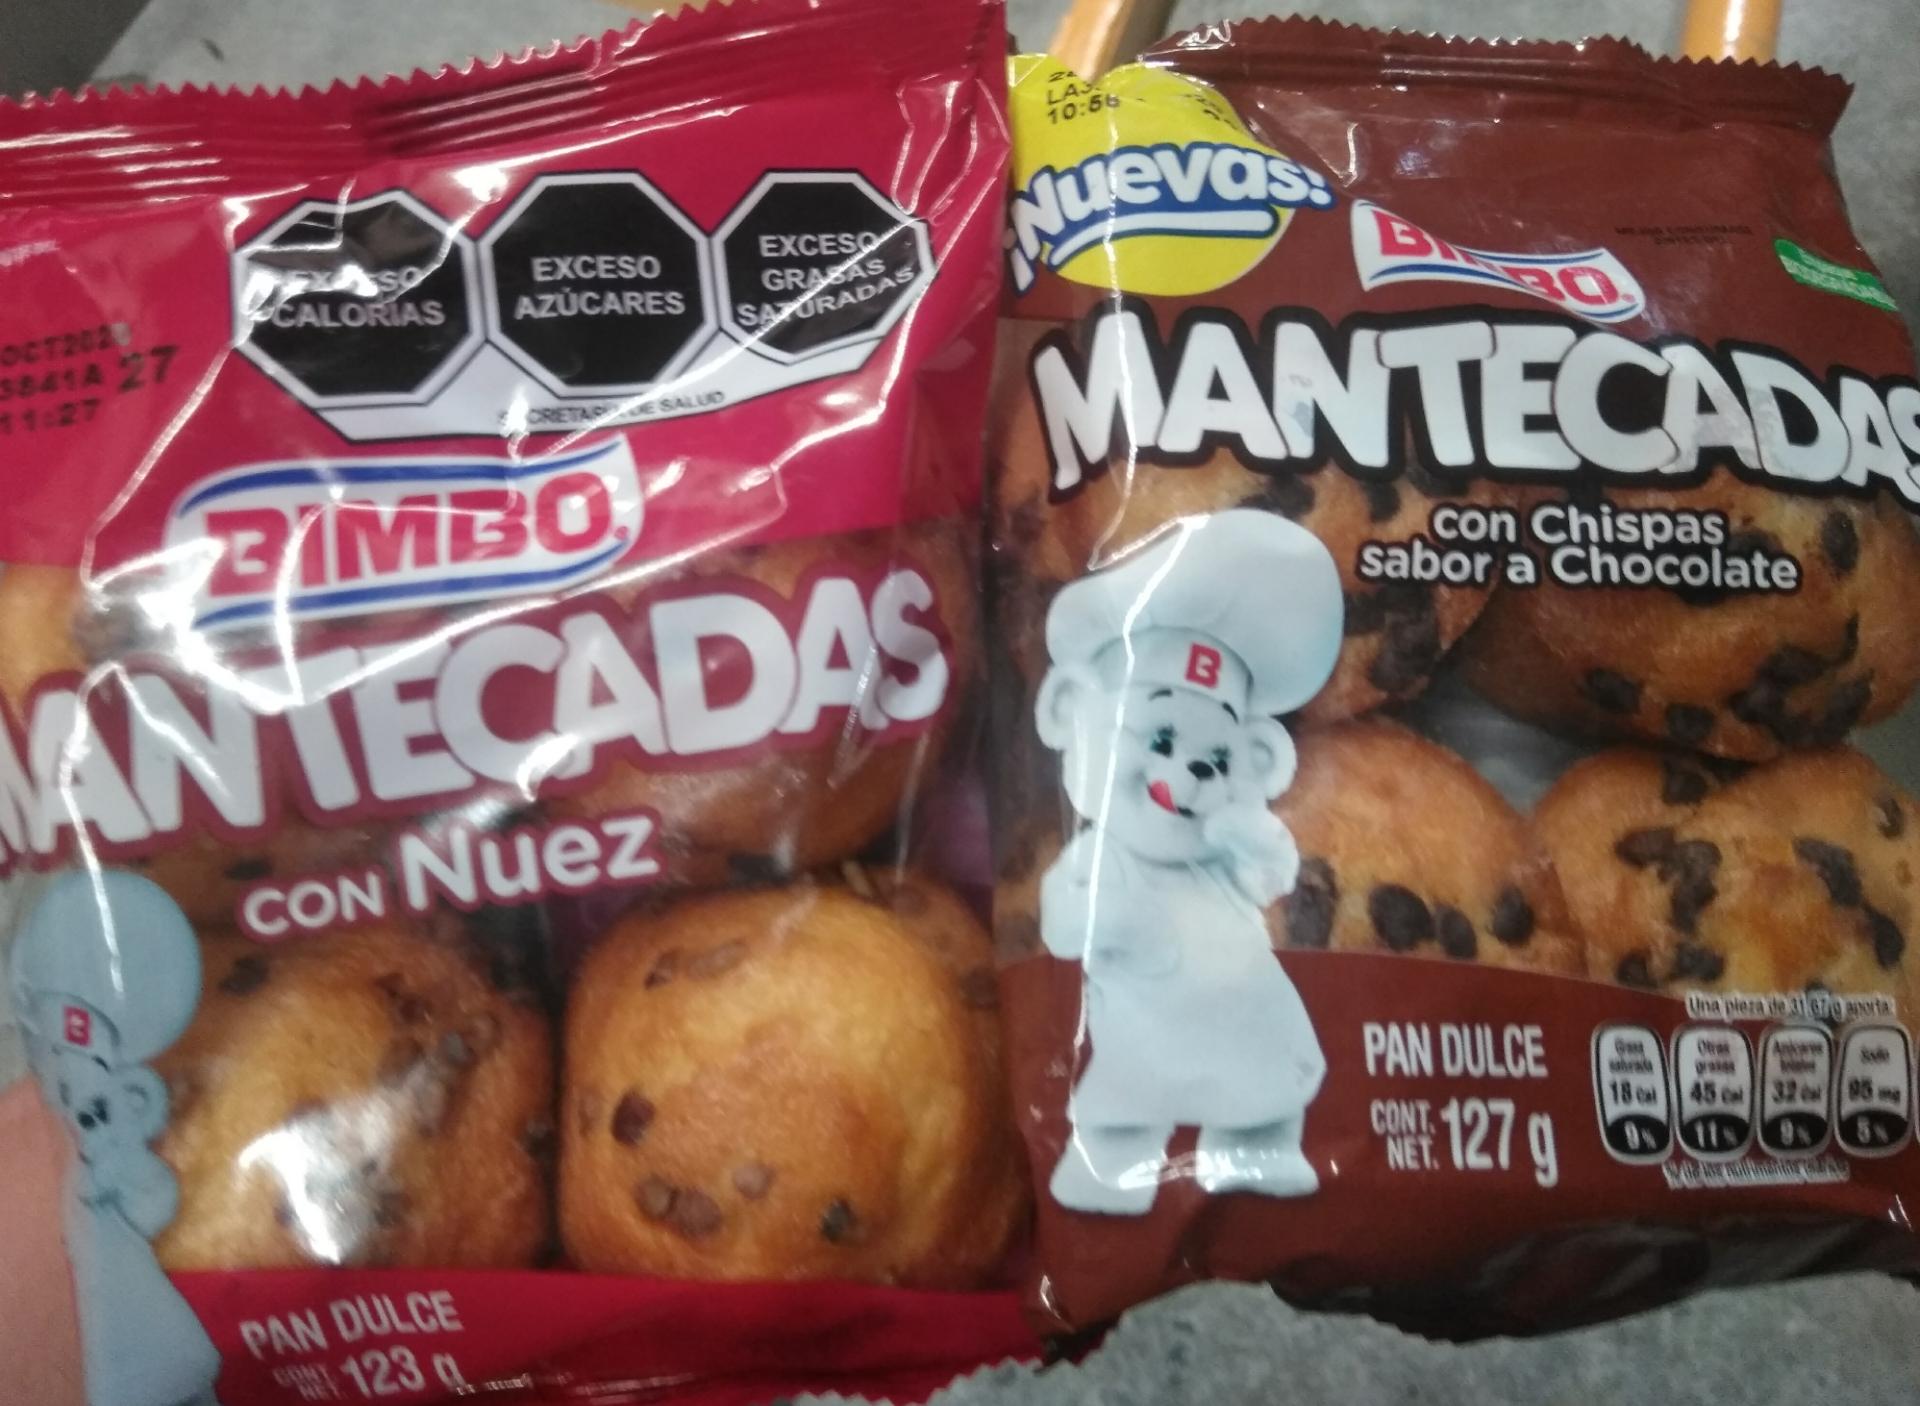 Oxxo: Variedad de Mantecadas 2 paquetes por 22 pesos.